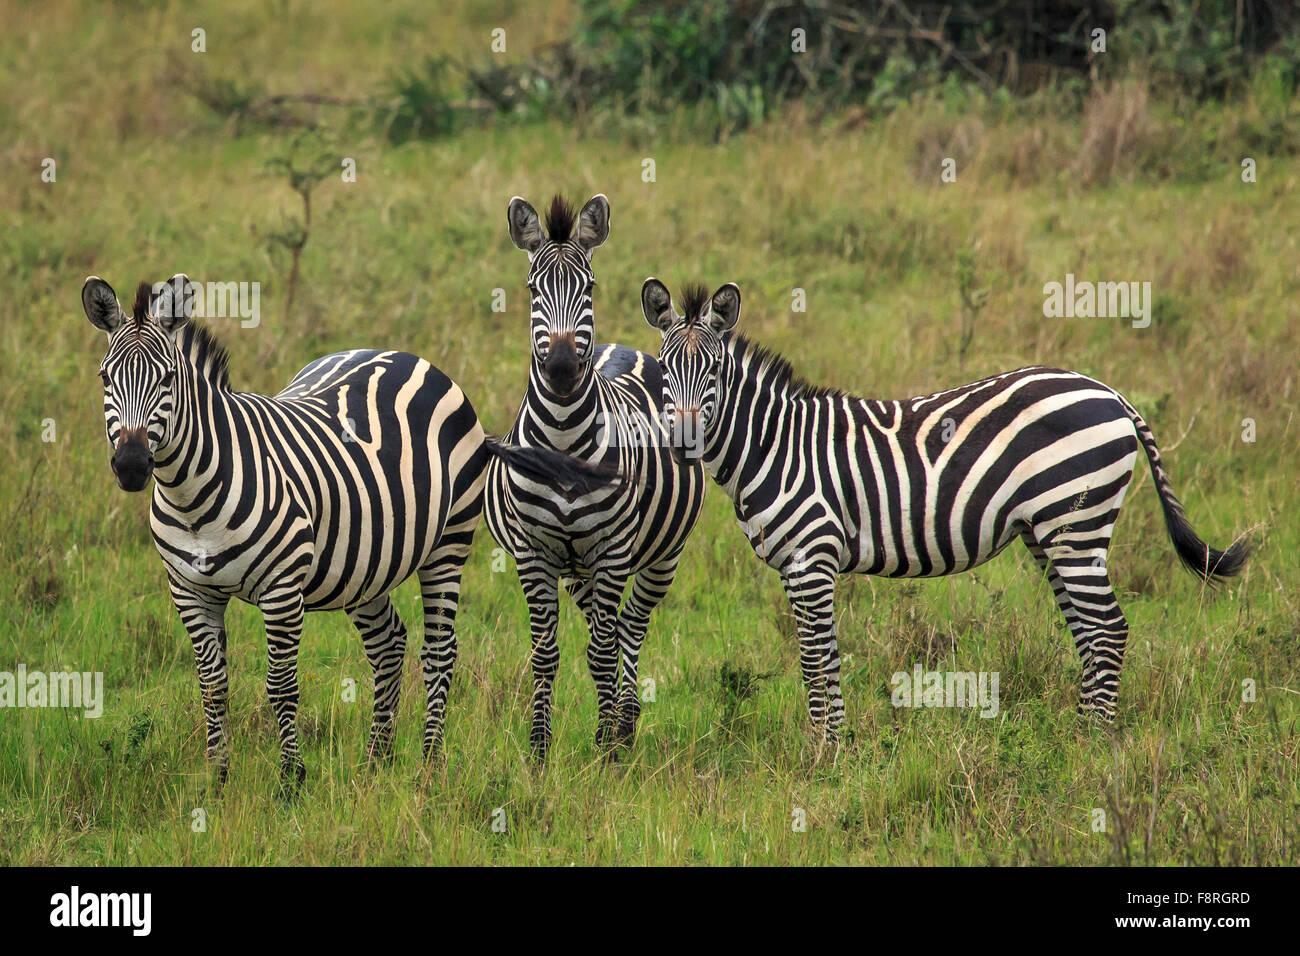 Three zebras on the grasslands of Rwanda - Stock Image